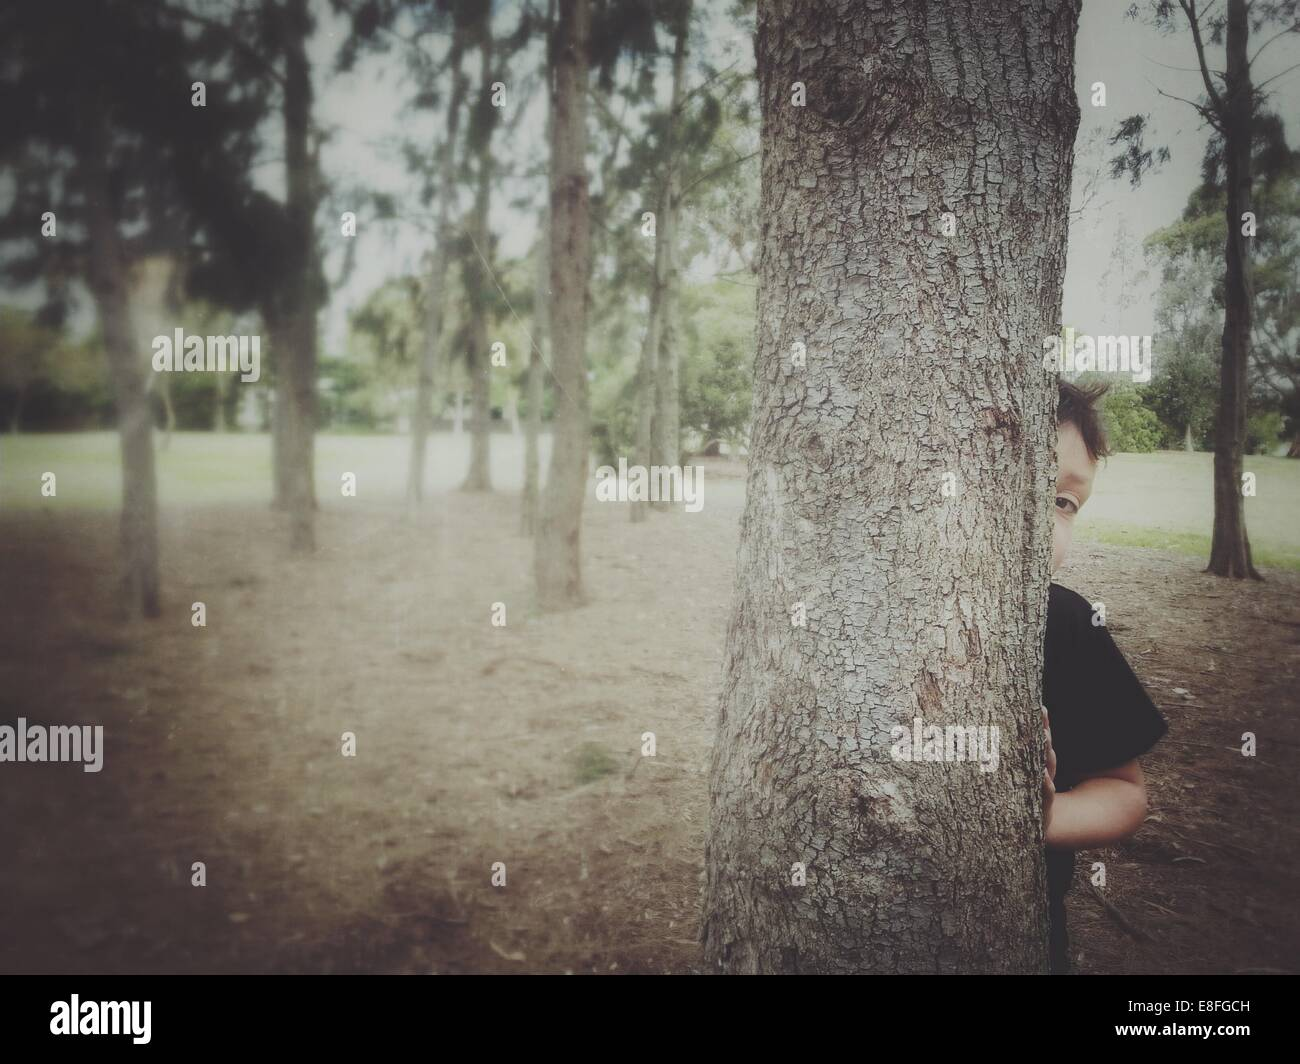 Boy hiding behind a tree - Stock Image